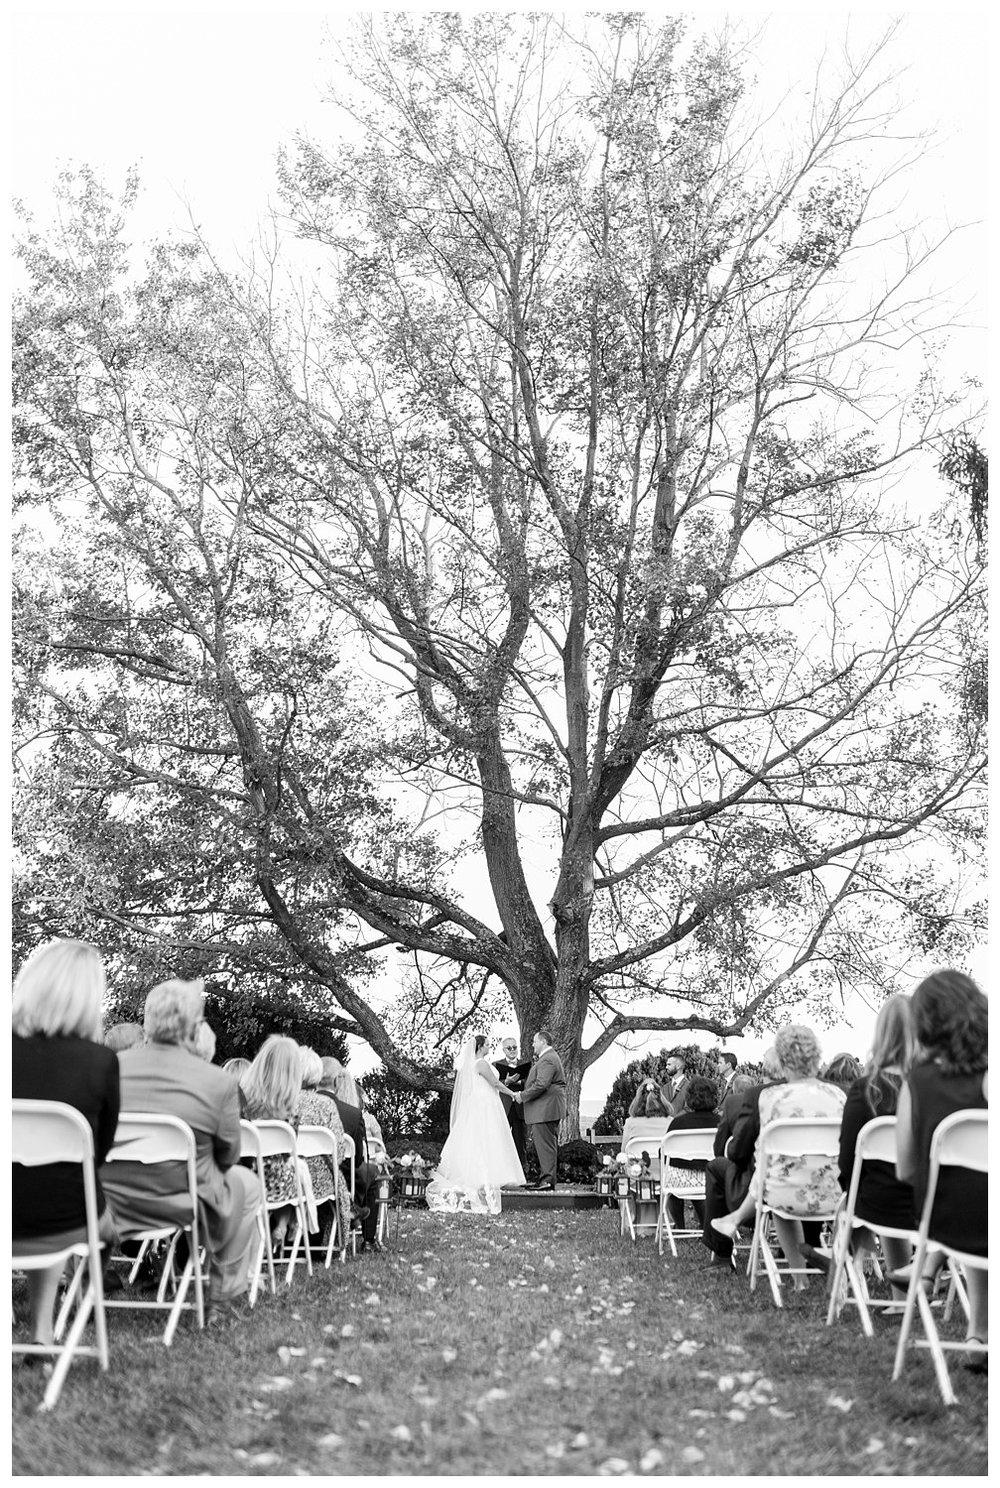 elovephotos gaie lea staunton virginia fall wedding photography_1100.jpg